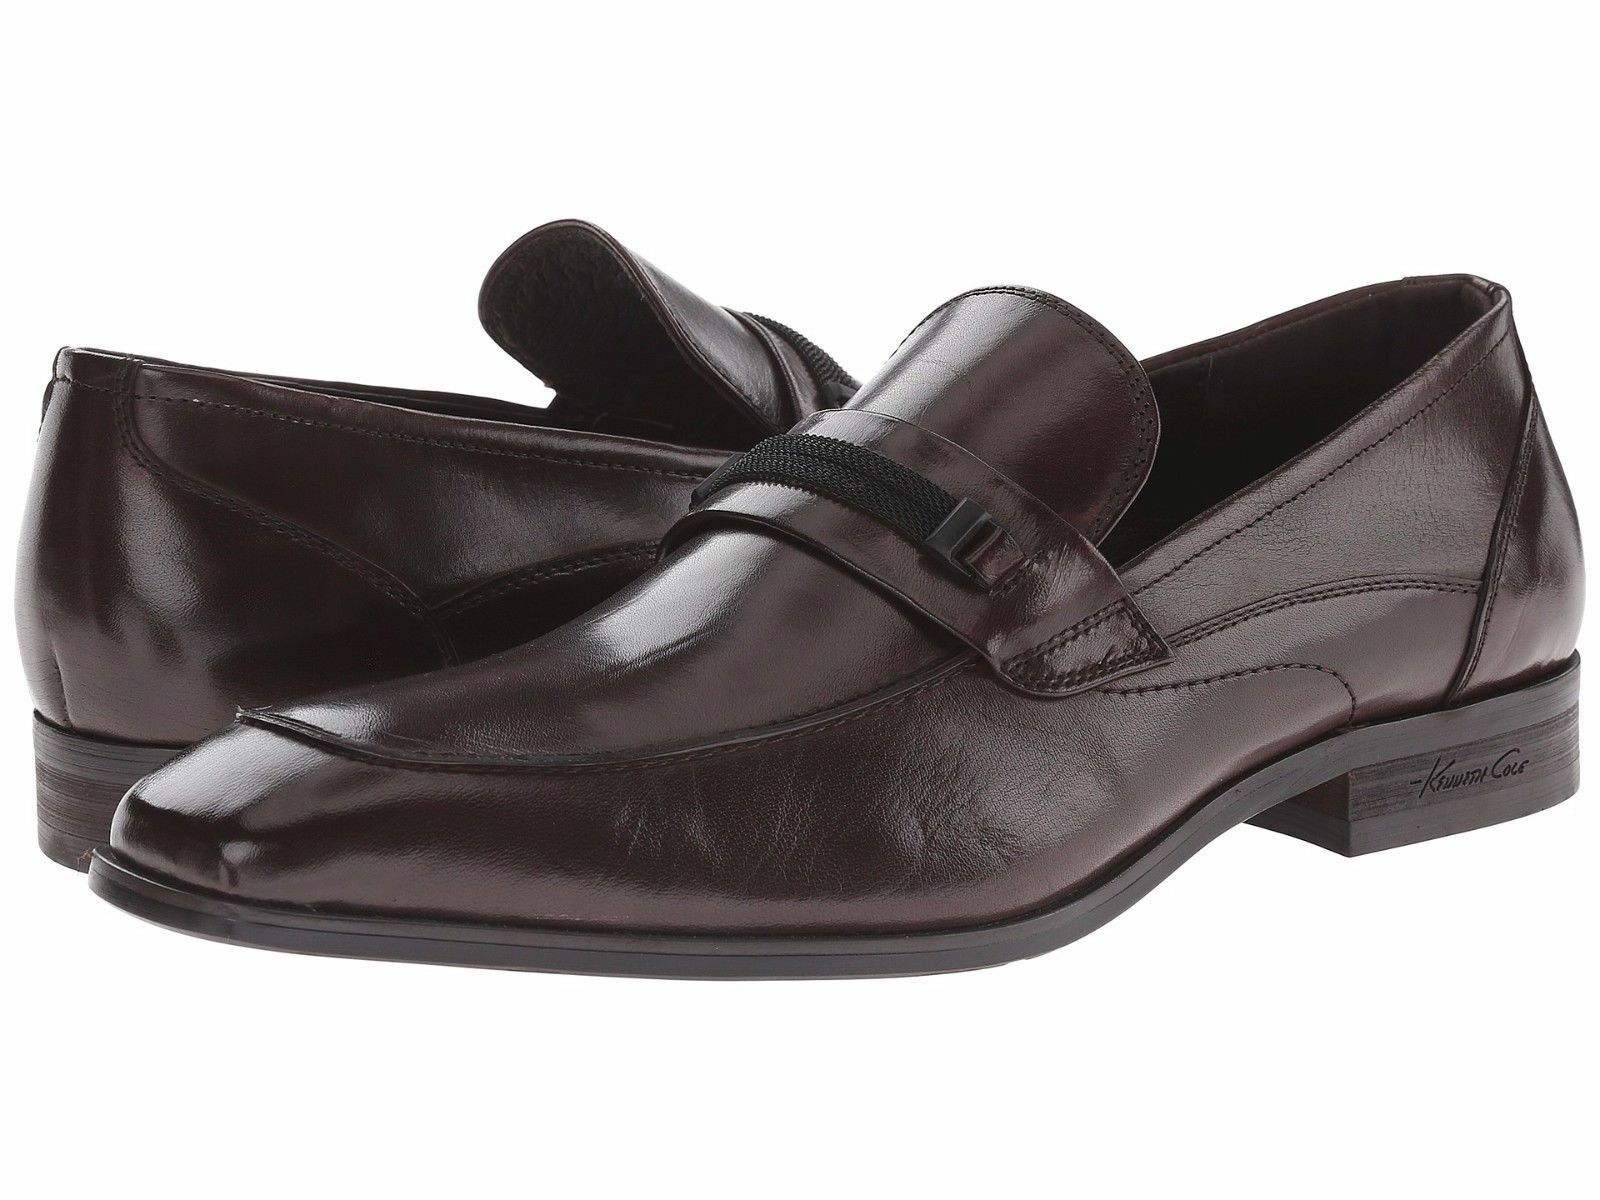 Size 11.5 KENNETH COLE Leather Mens shoes  Reg 158 Sale  79.99 LastPairs